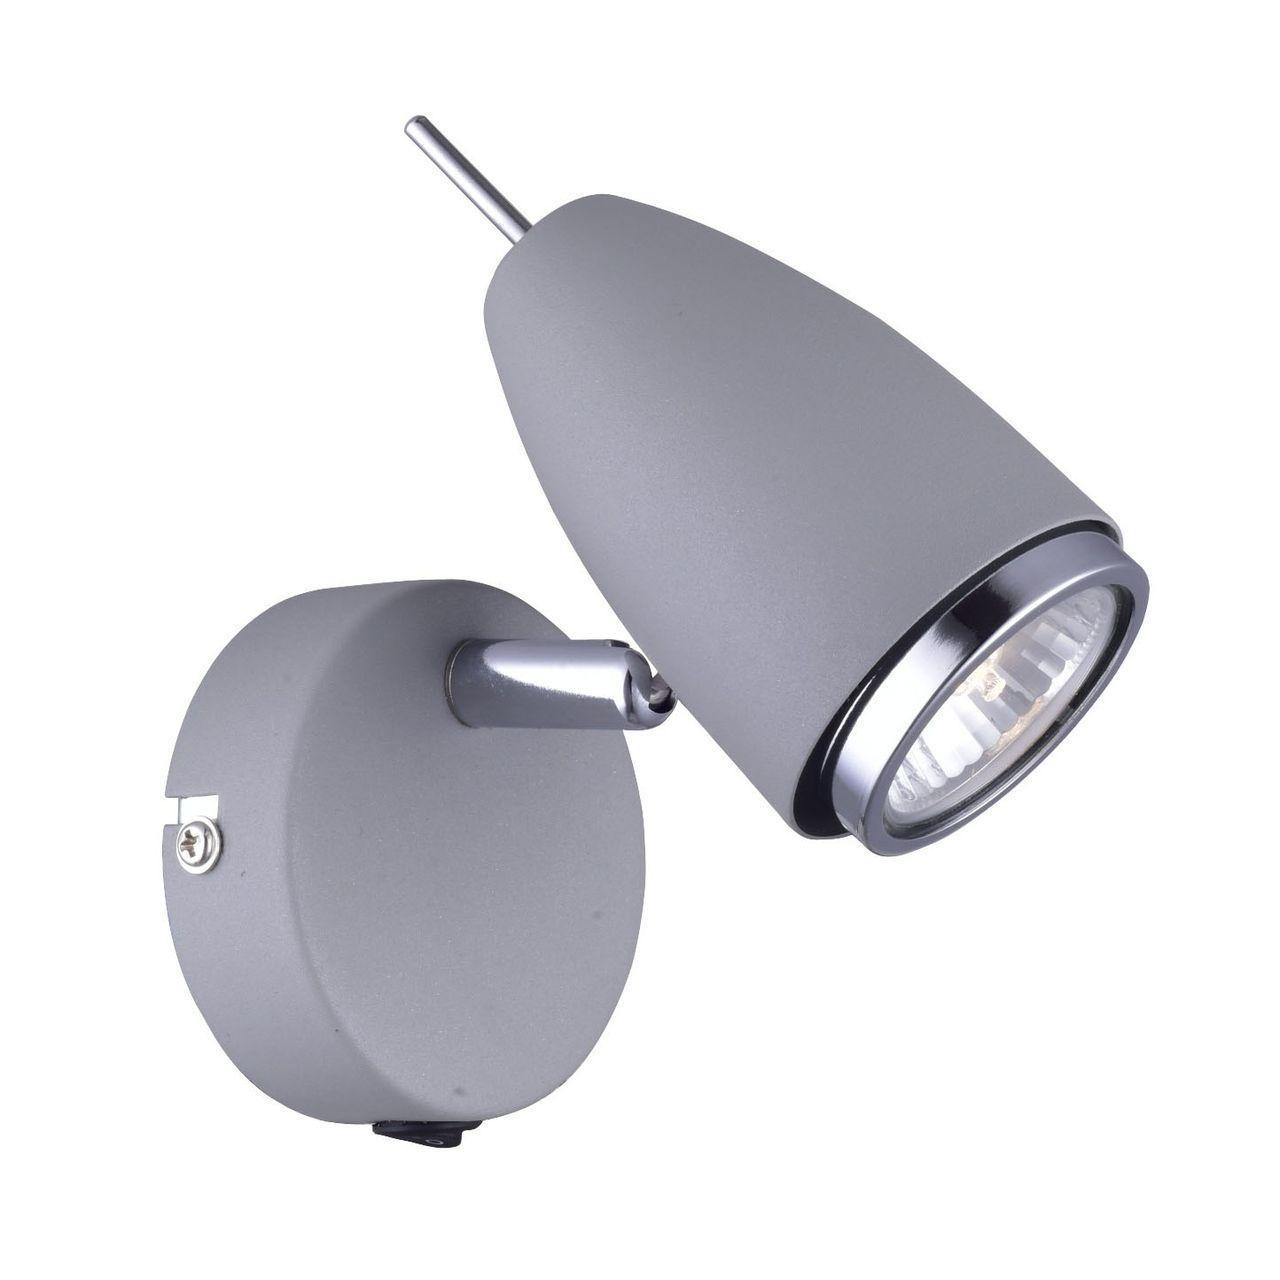 Спот Arte Lamp Regista A1966AP-1GY спот arte lamp a1966ap 1gy